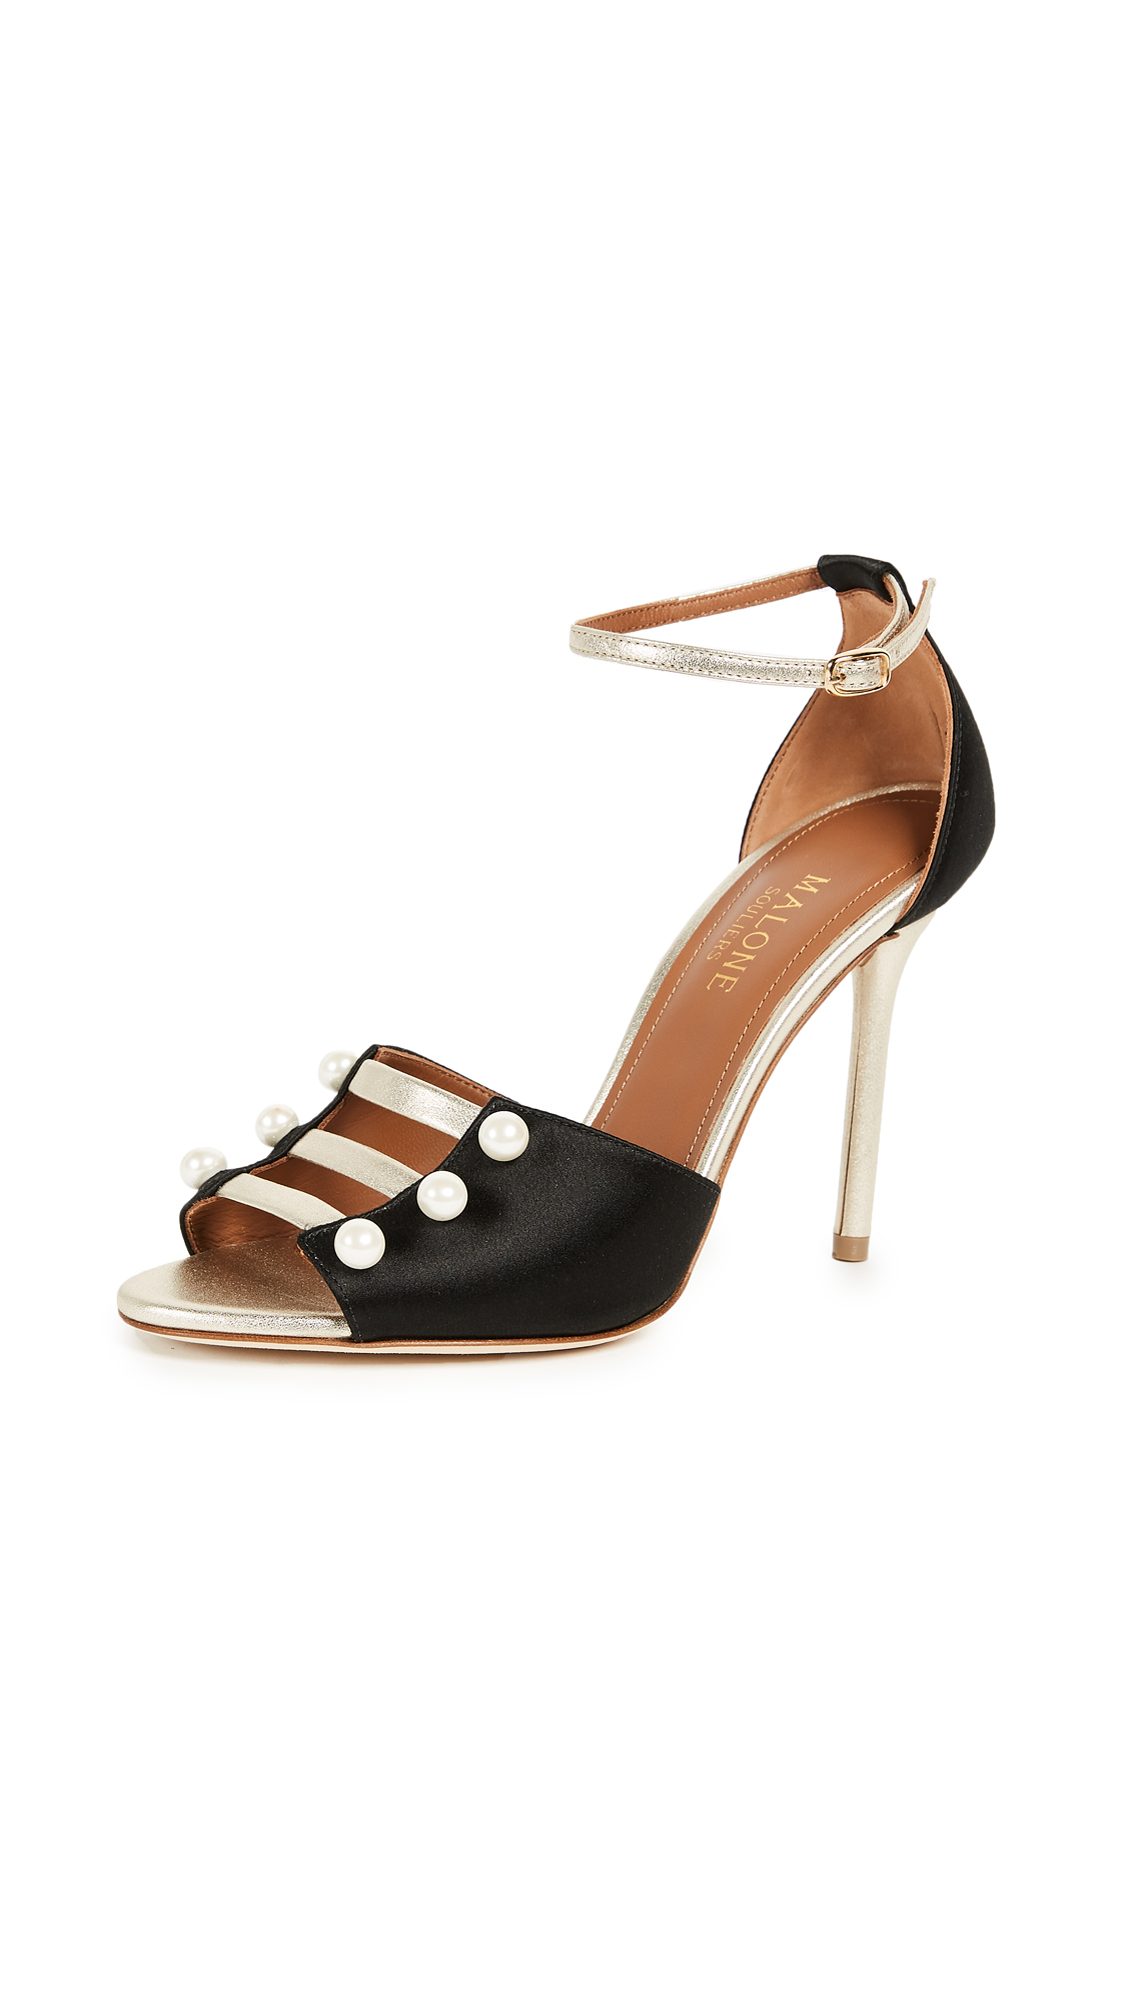 Malone Souliers Zuzu 100mm Sandals - Black/Platino